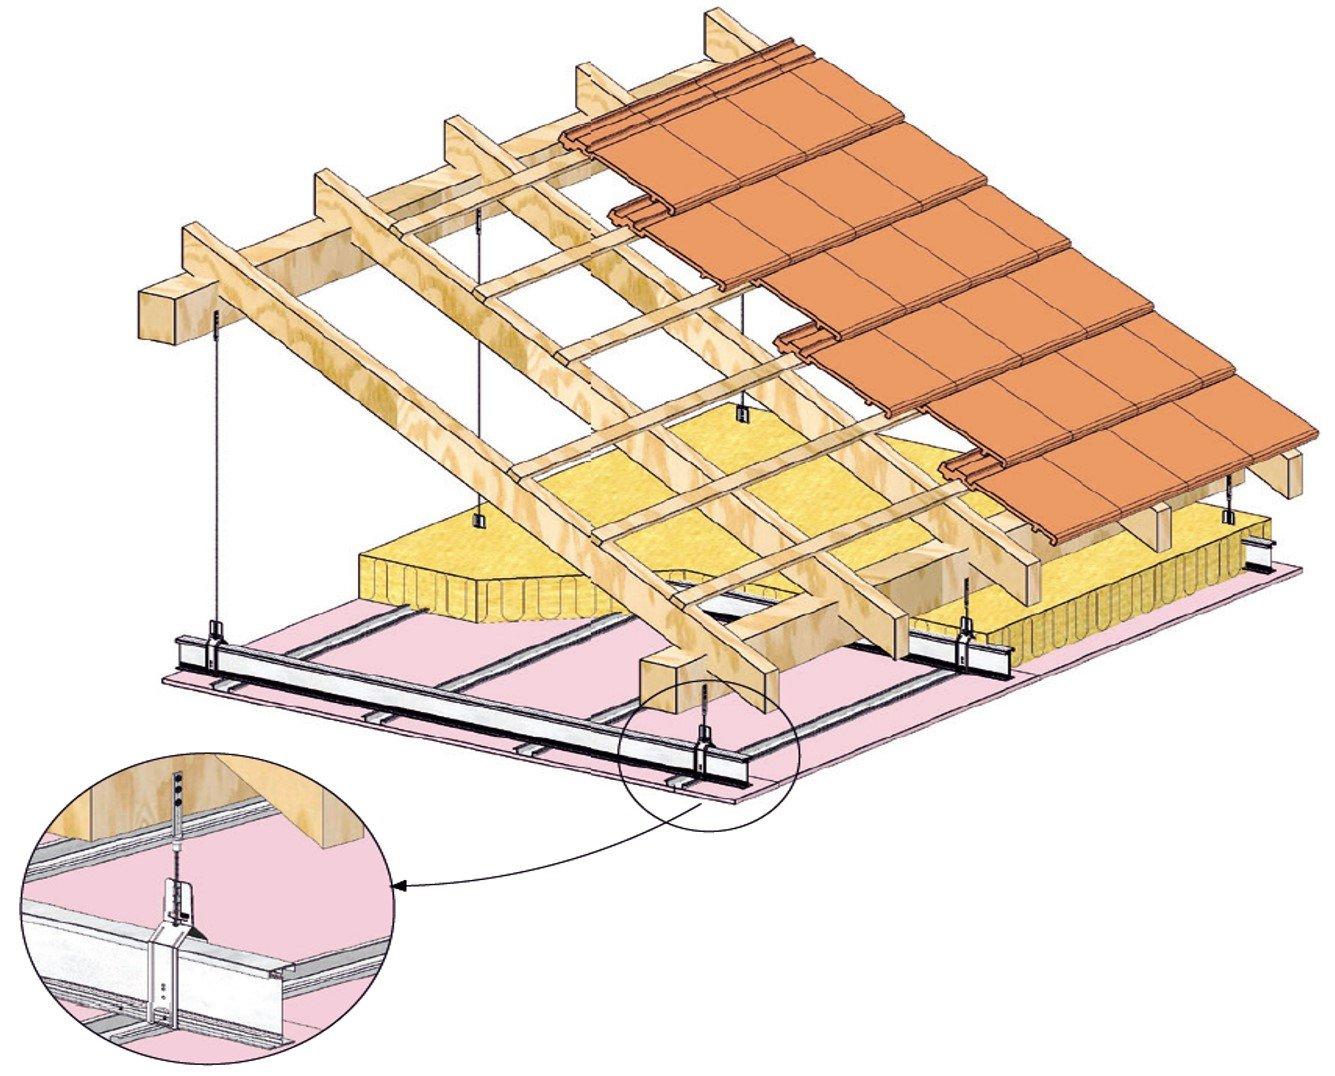 Plafond knauf m tal 2 kf13 plafonds pl tre knauf m tal for Suspente knauf